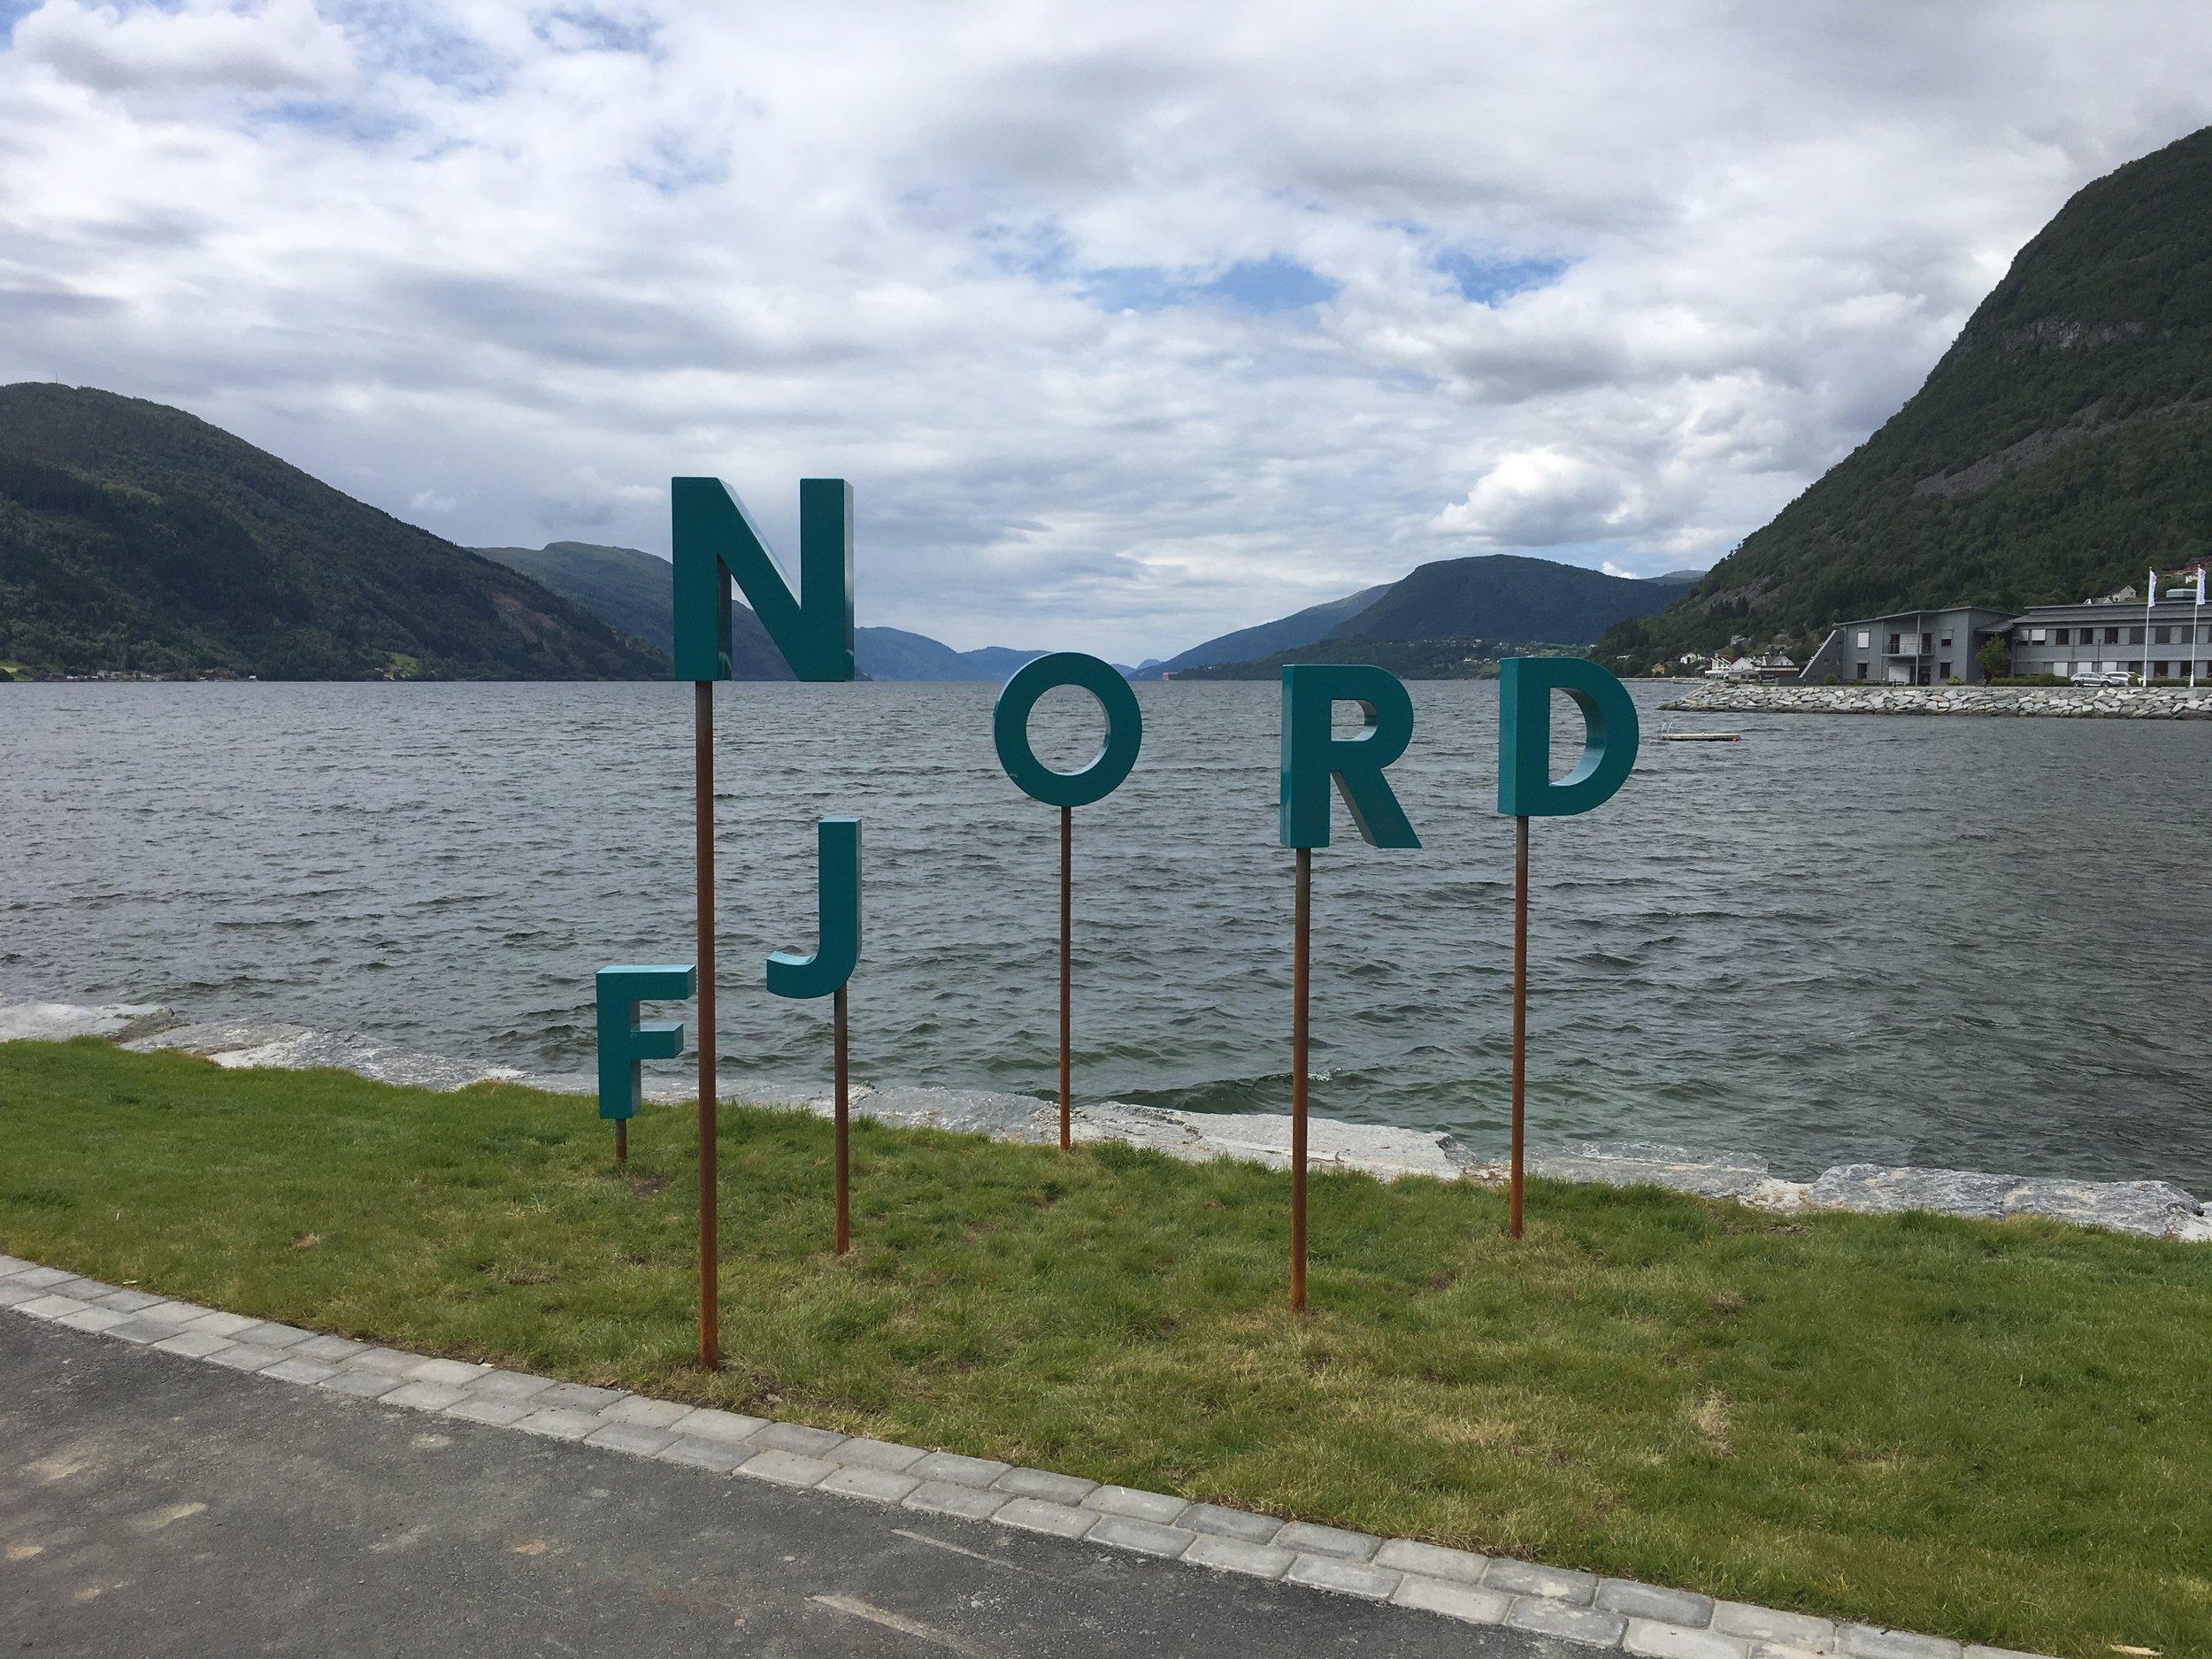 New Nordfjord logo at Nordfjordeid